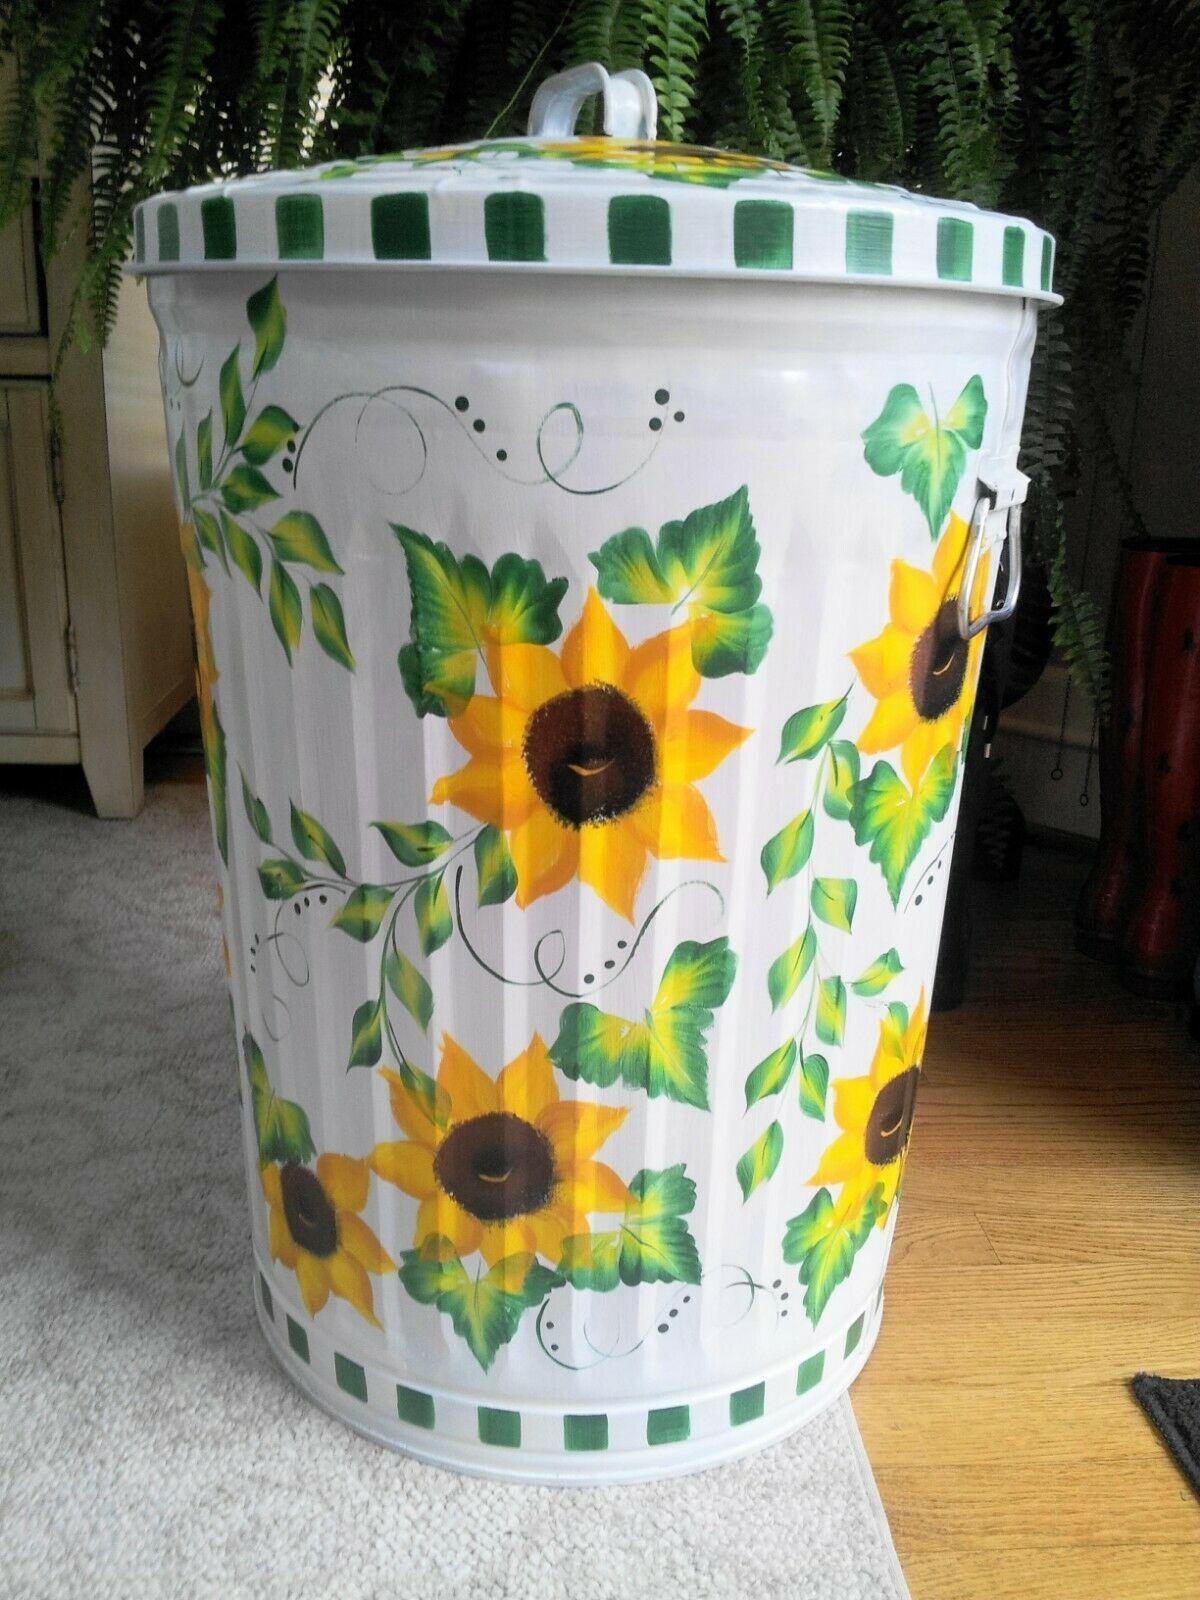 Https Ift Tt 2z8hmvz Trash Cans Ideas Of Trash Cans Trashcans Trash Painted Trash Cans Painted Mailboxes Metal Trash Cans